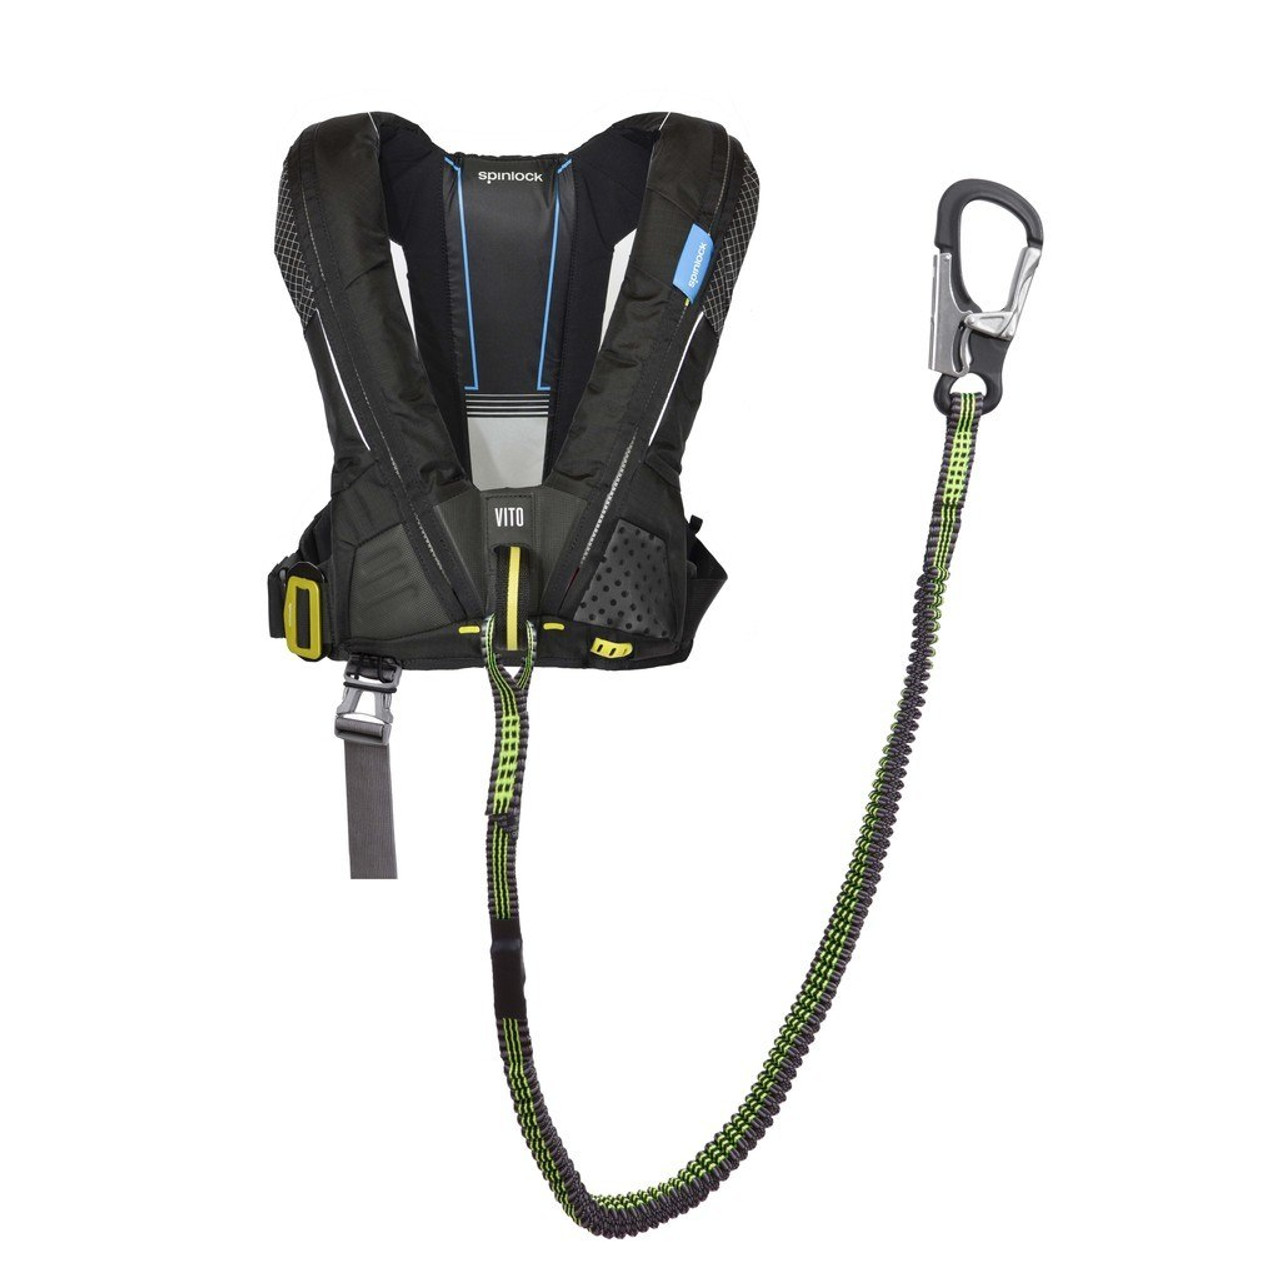 Spinlock Deckvest VITO Offshore 170N Hammar Lifejacket + MOB1 + Tether - SPECIAL OFFER